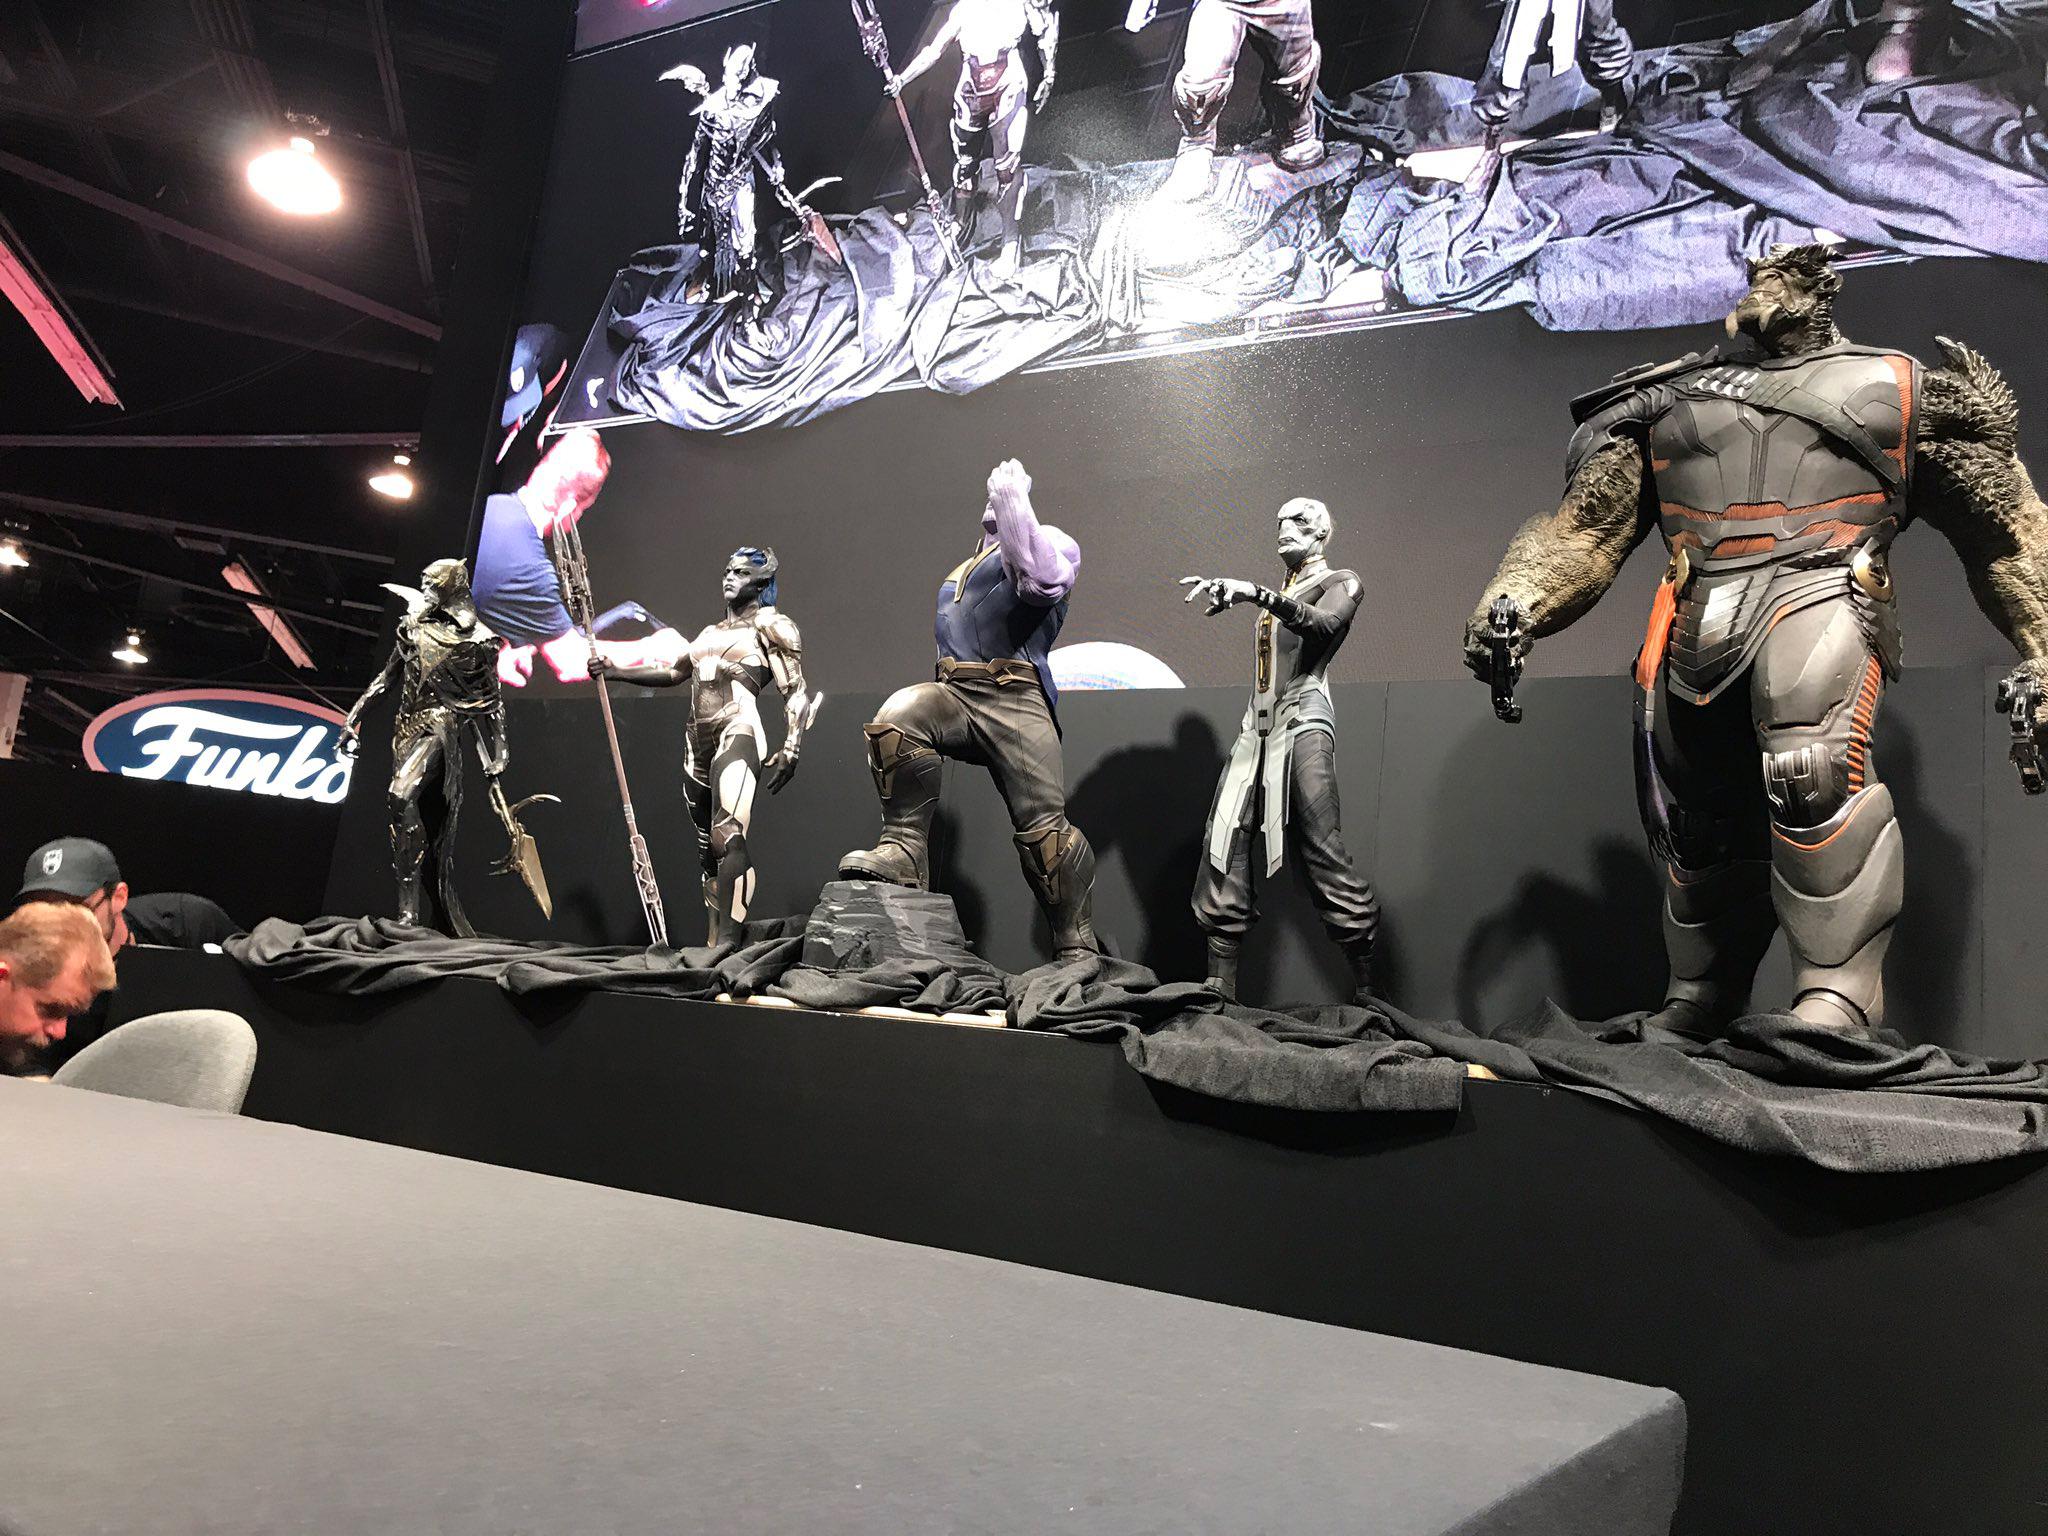 Se muestra un tráiler de Avengers: Infinity War durante la D23 Expo